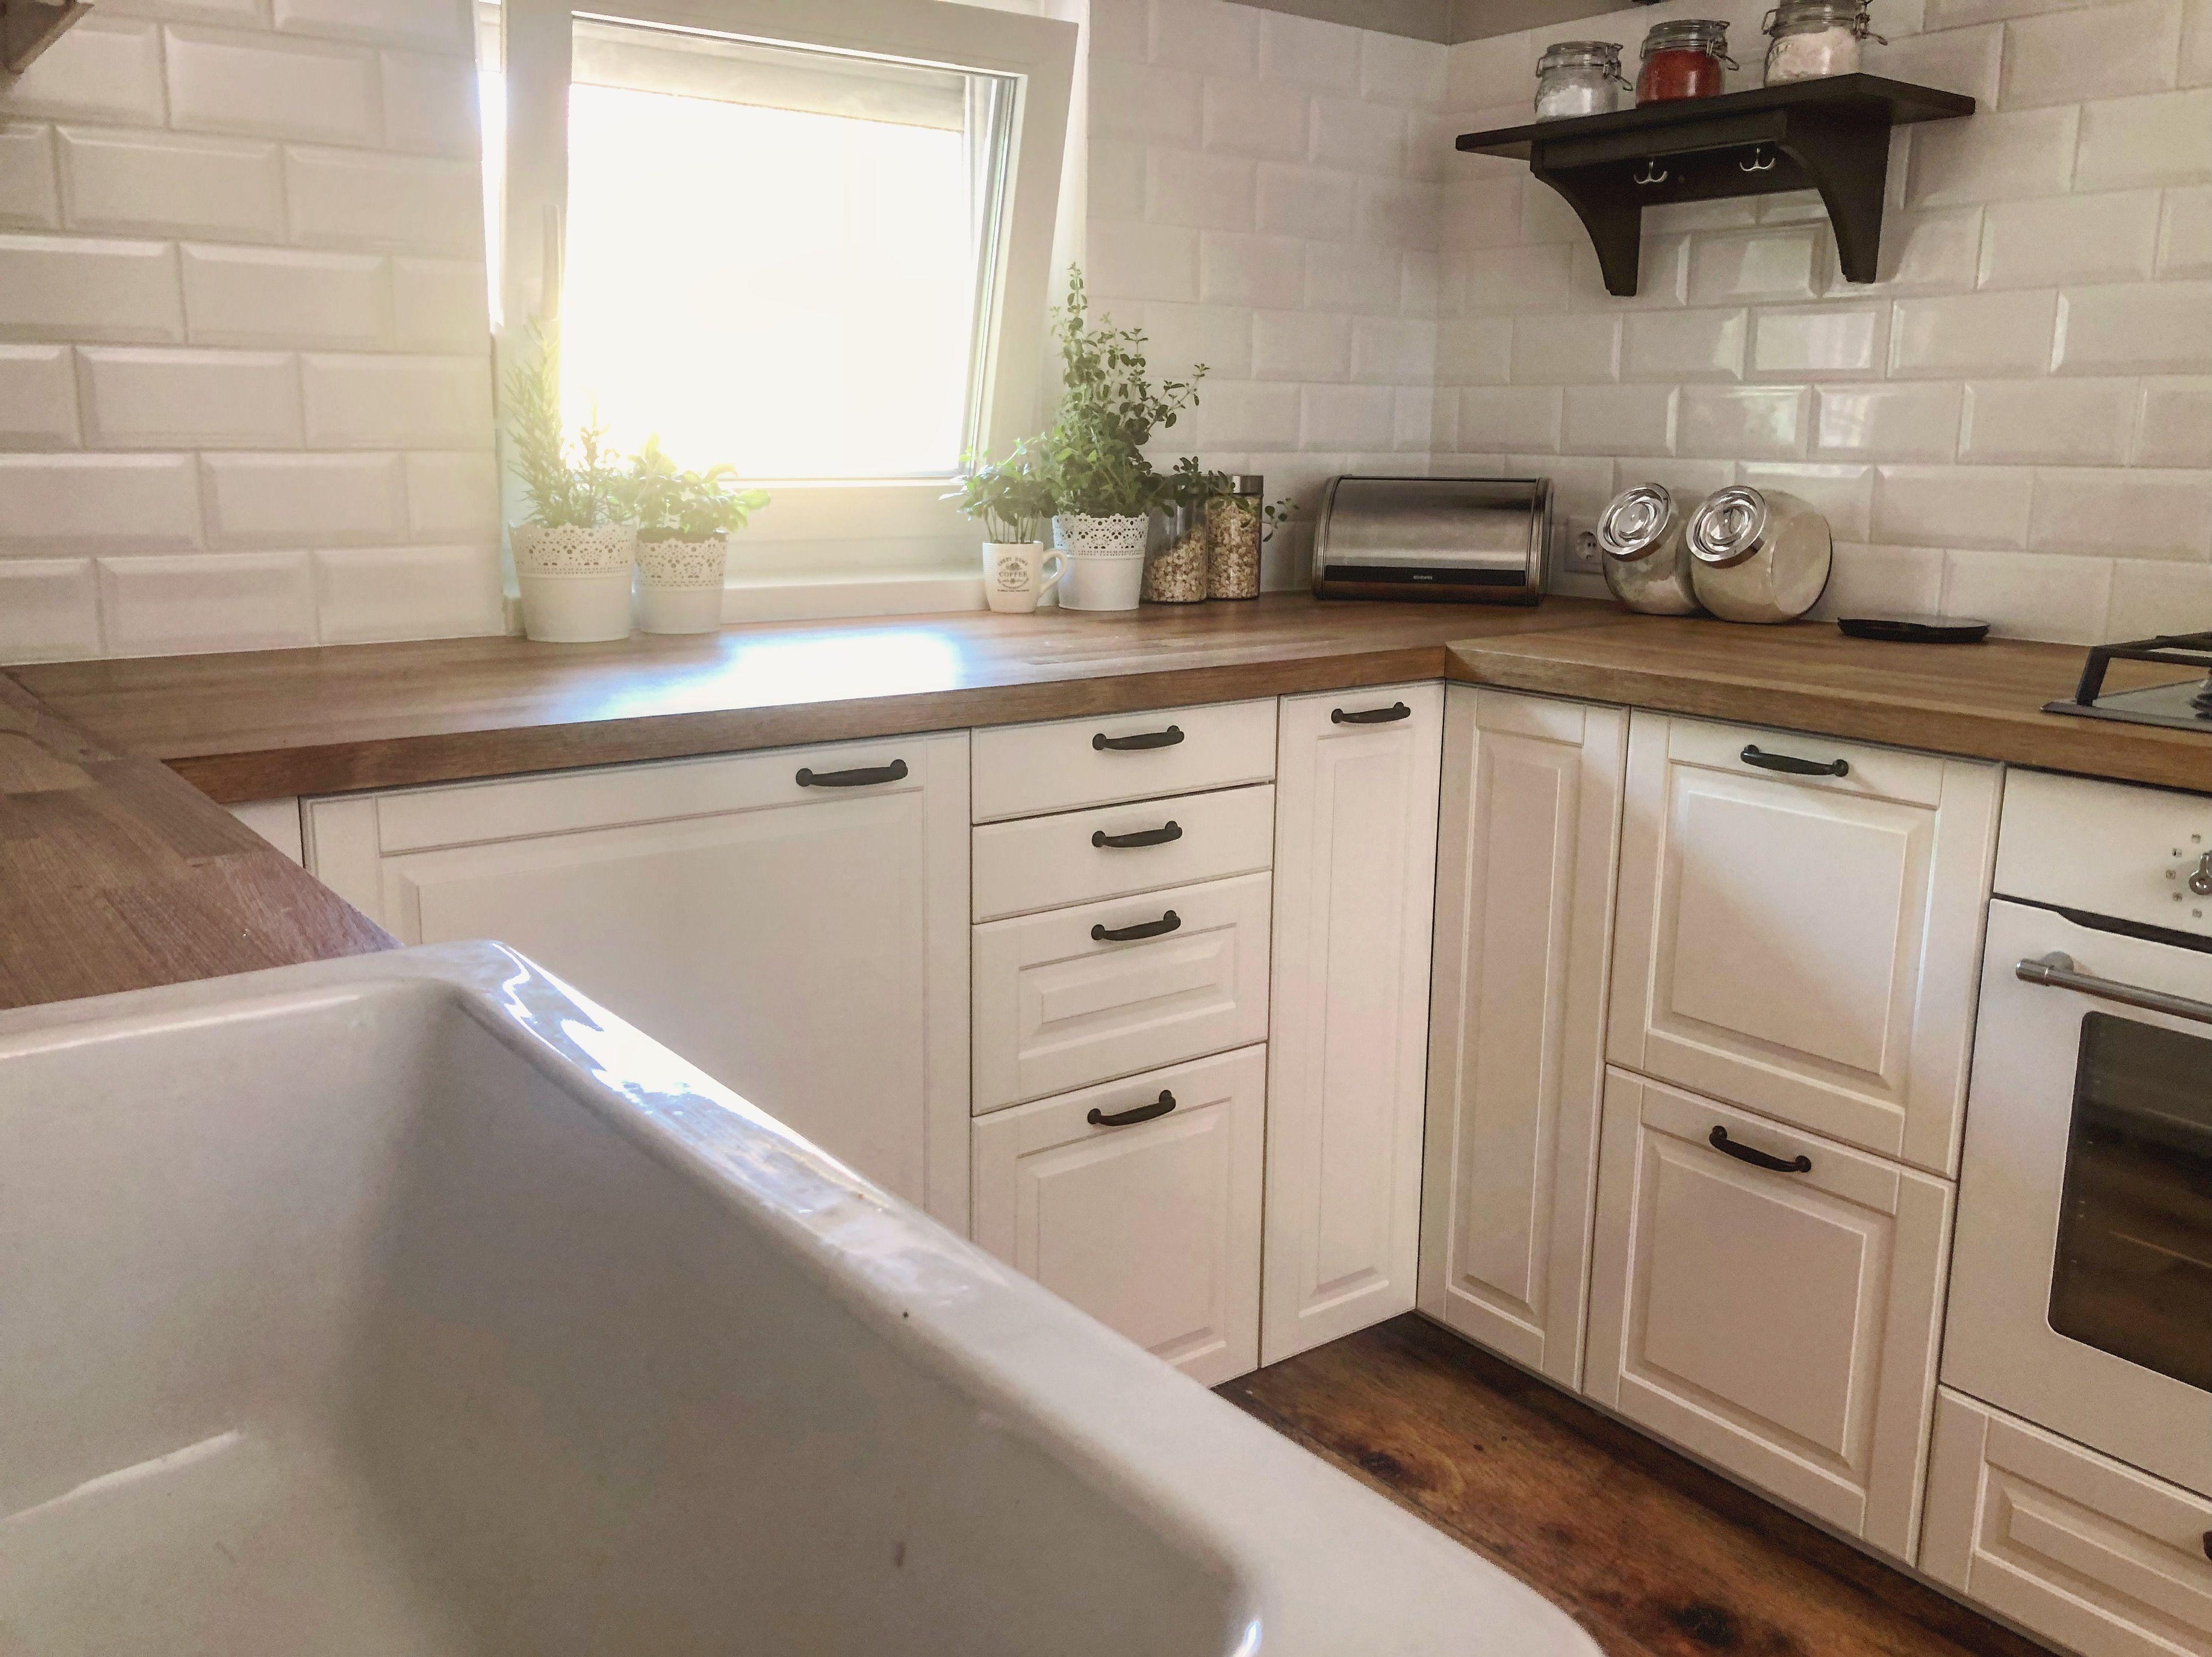 Ikea Metod - Bodbyn  Kitchen, Bodbyn, Kitchen design